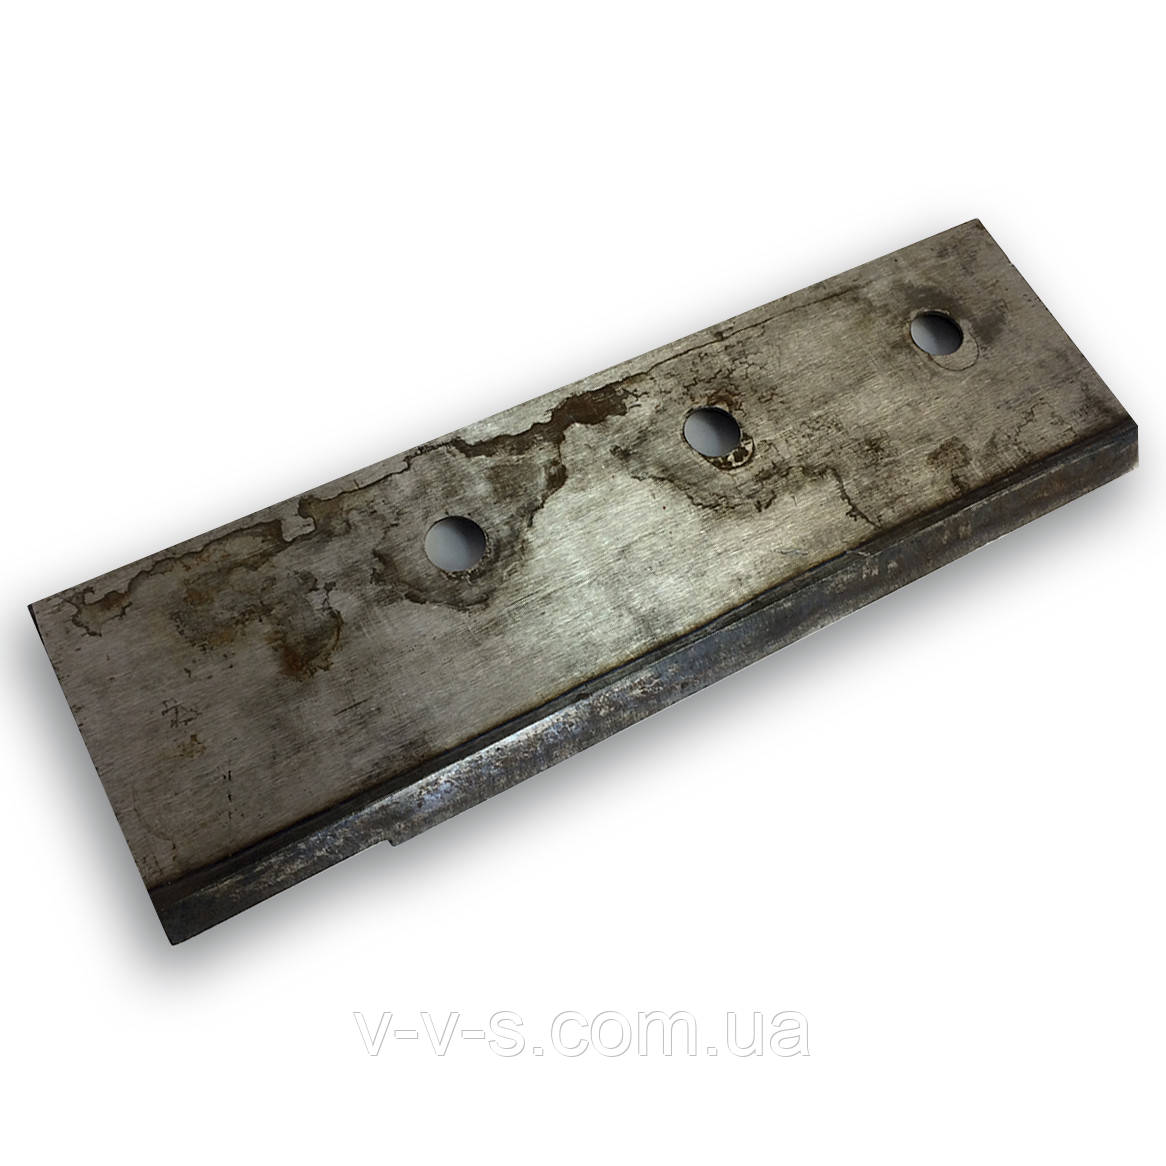 Нож поршня ПСБ 53 524 Киргизстан